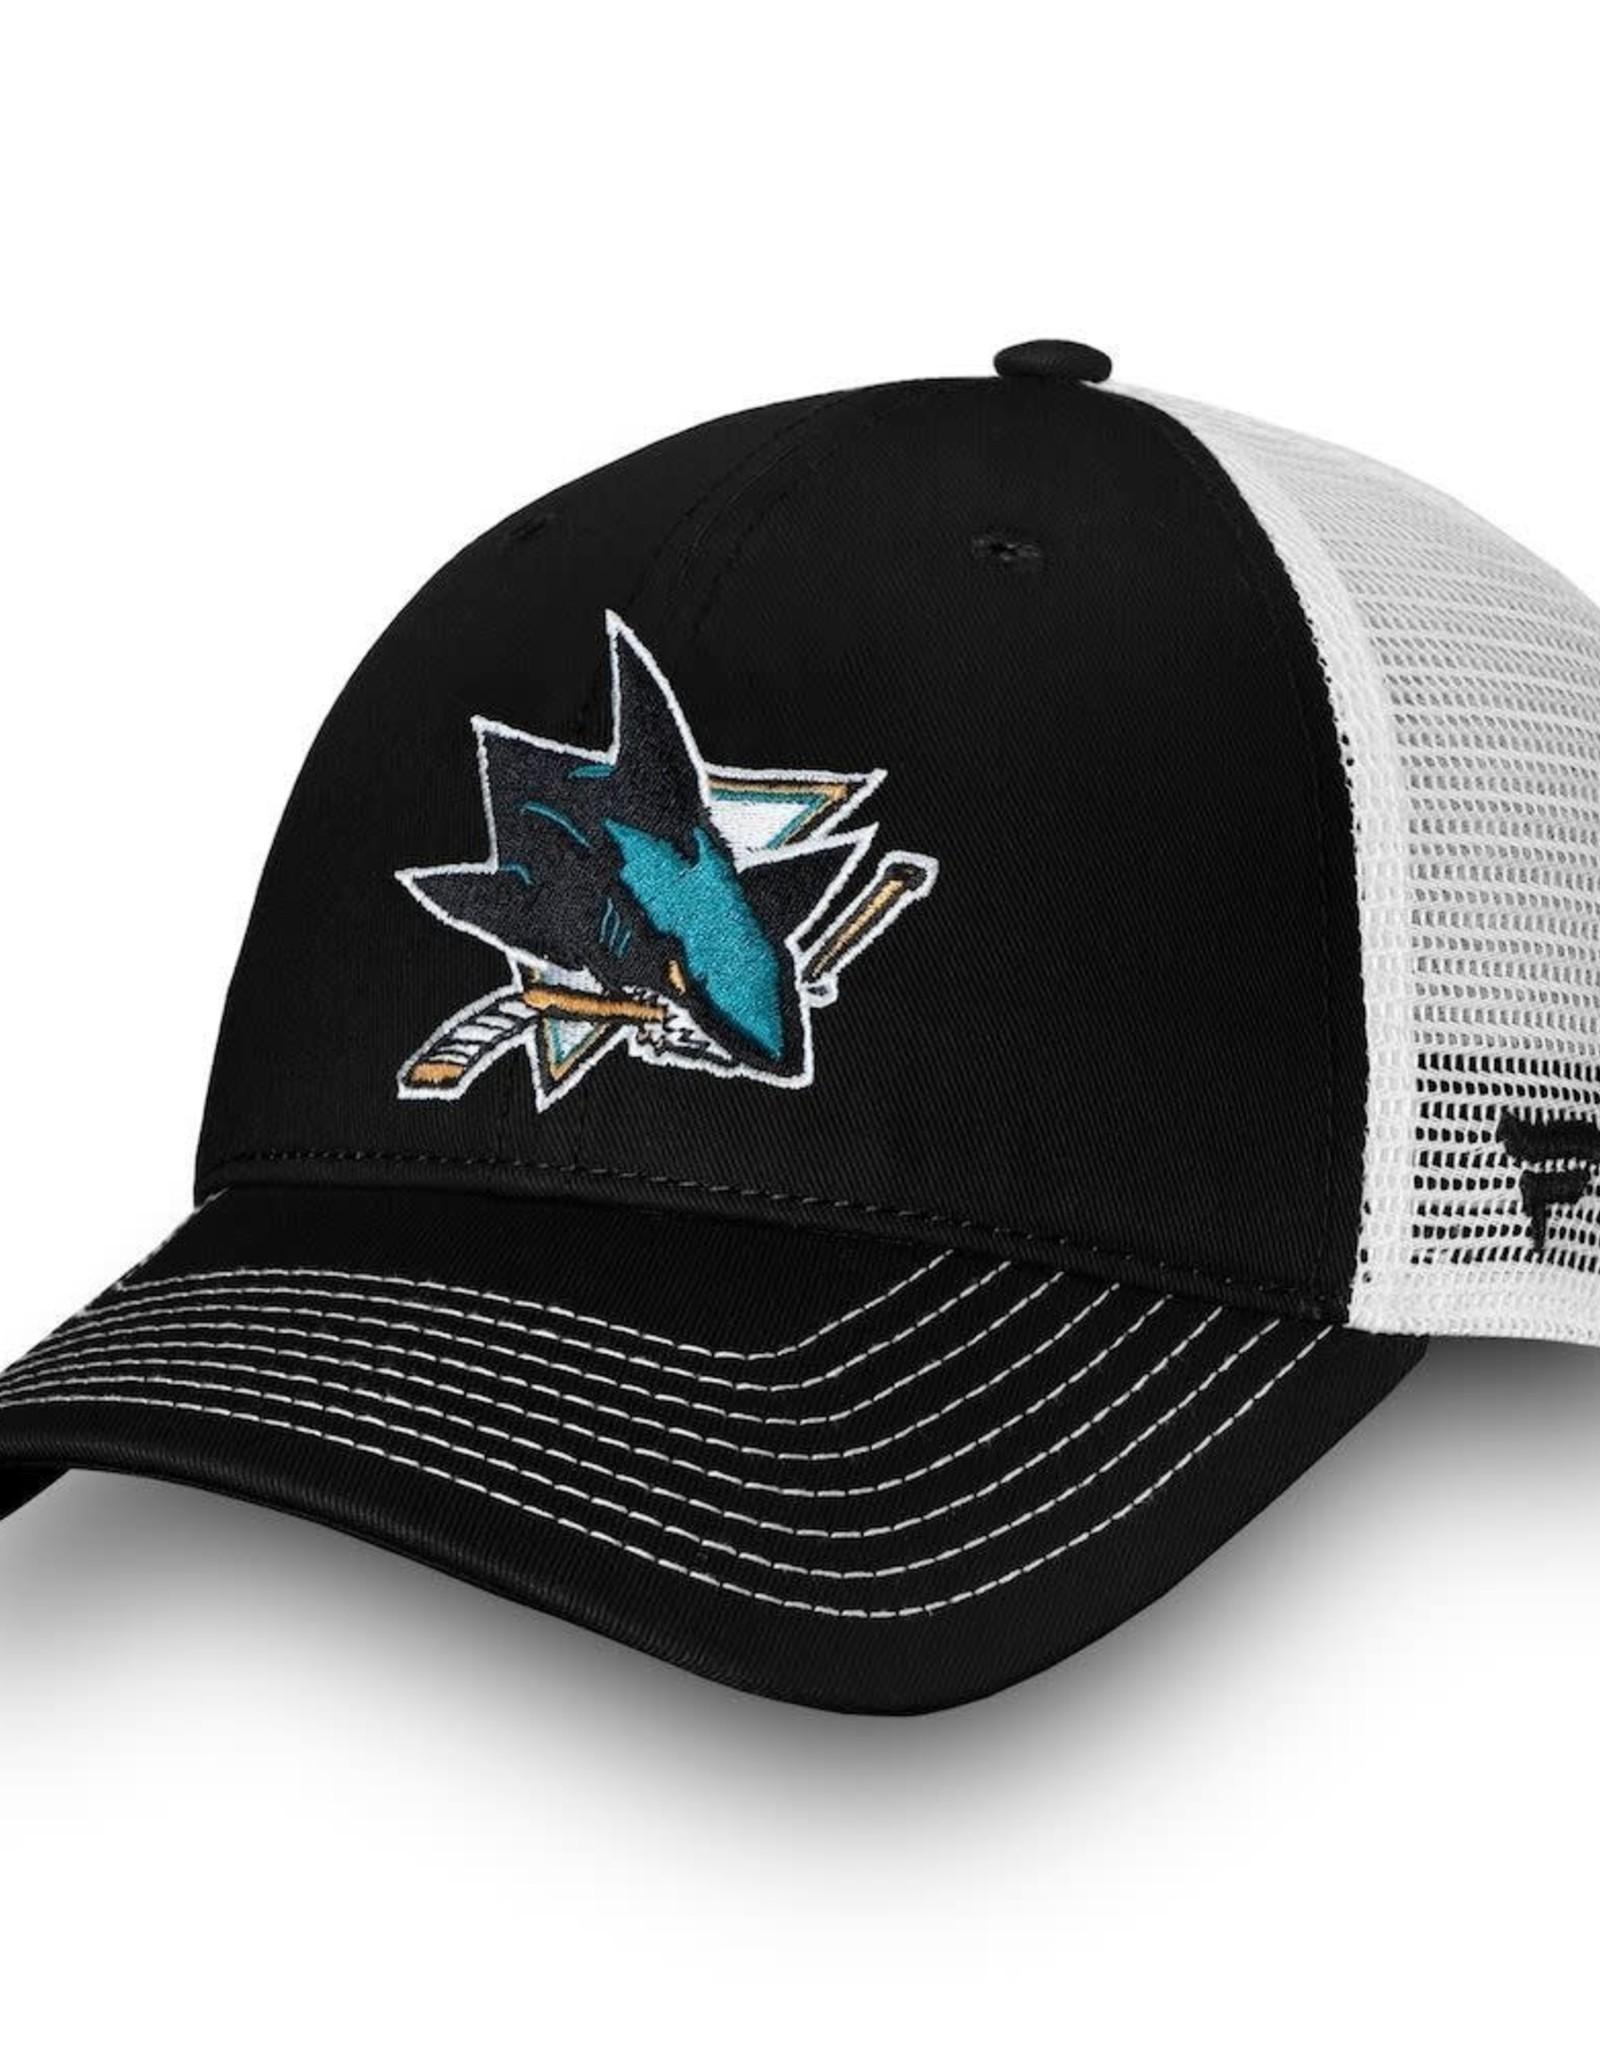 Trucker Adjustable Cap San Jose Sharks